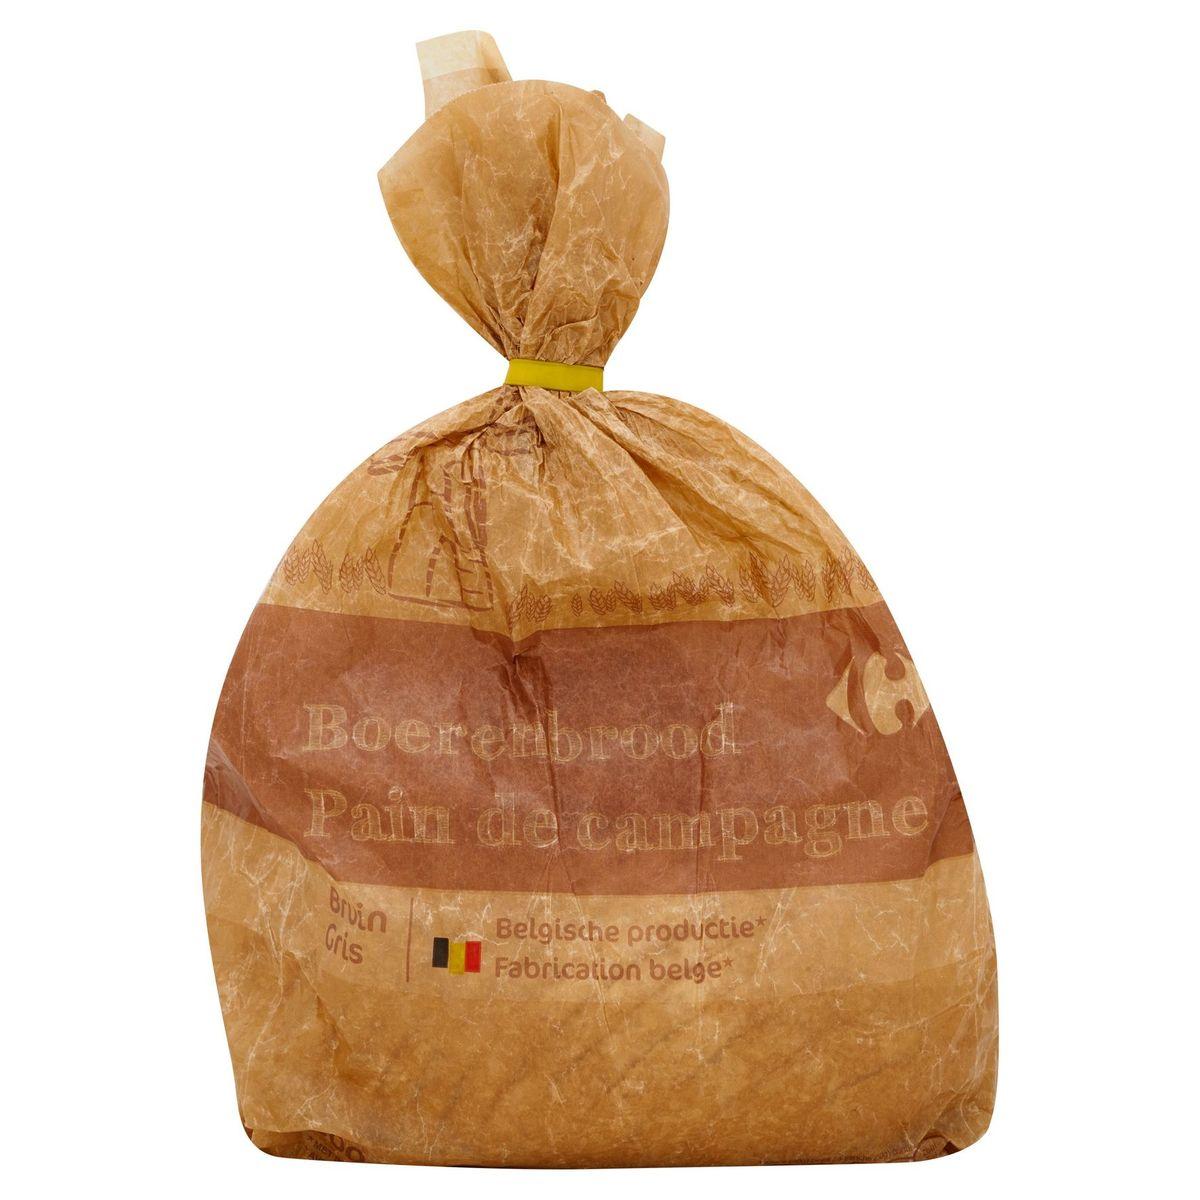 Carrefour Boerenbrood Bruin 800 g